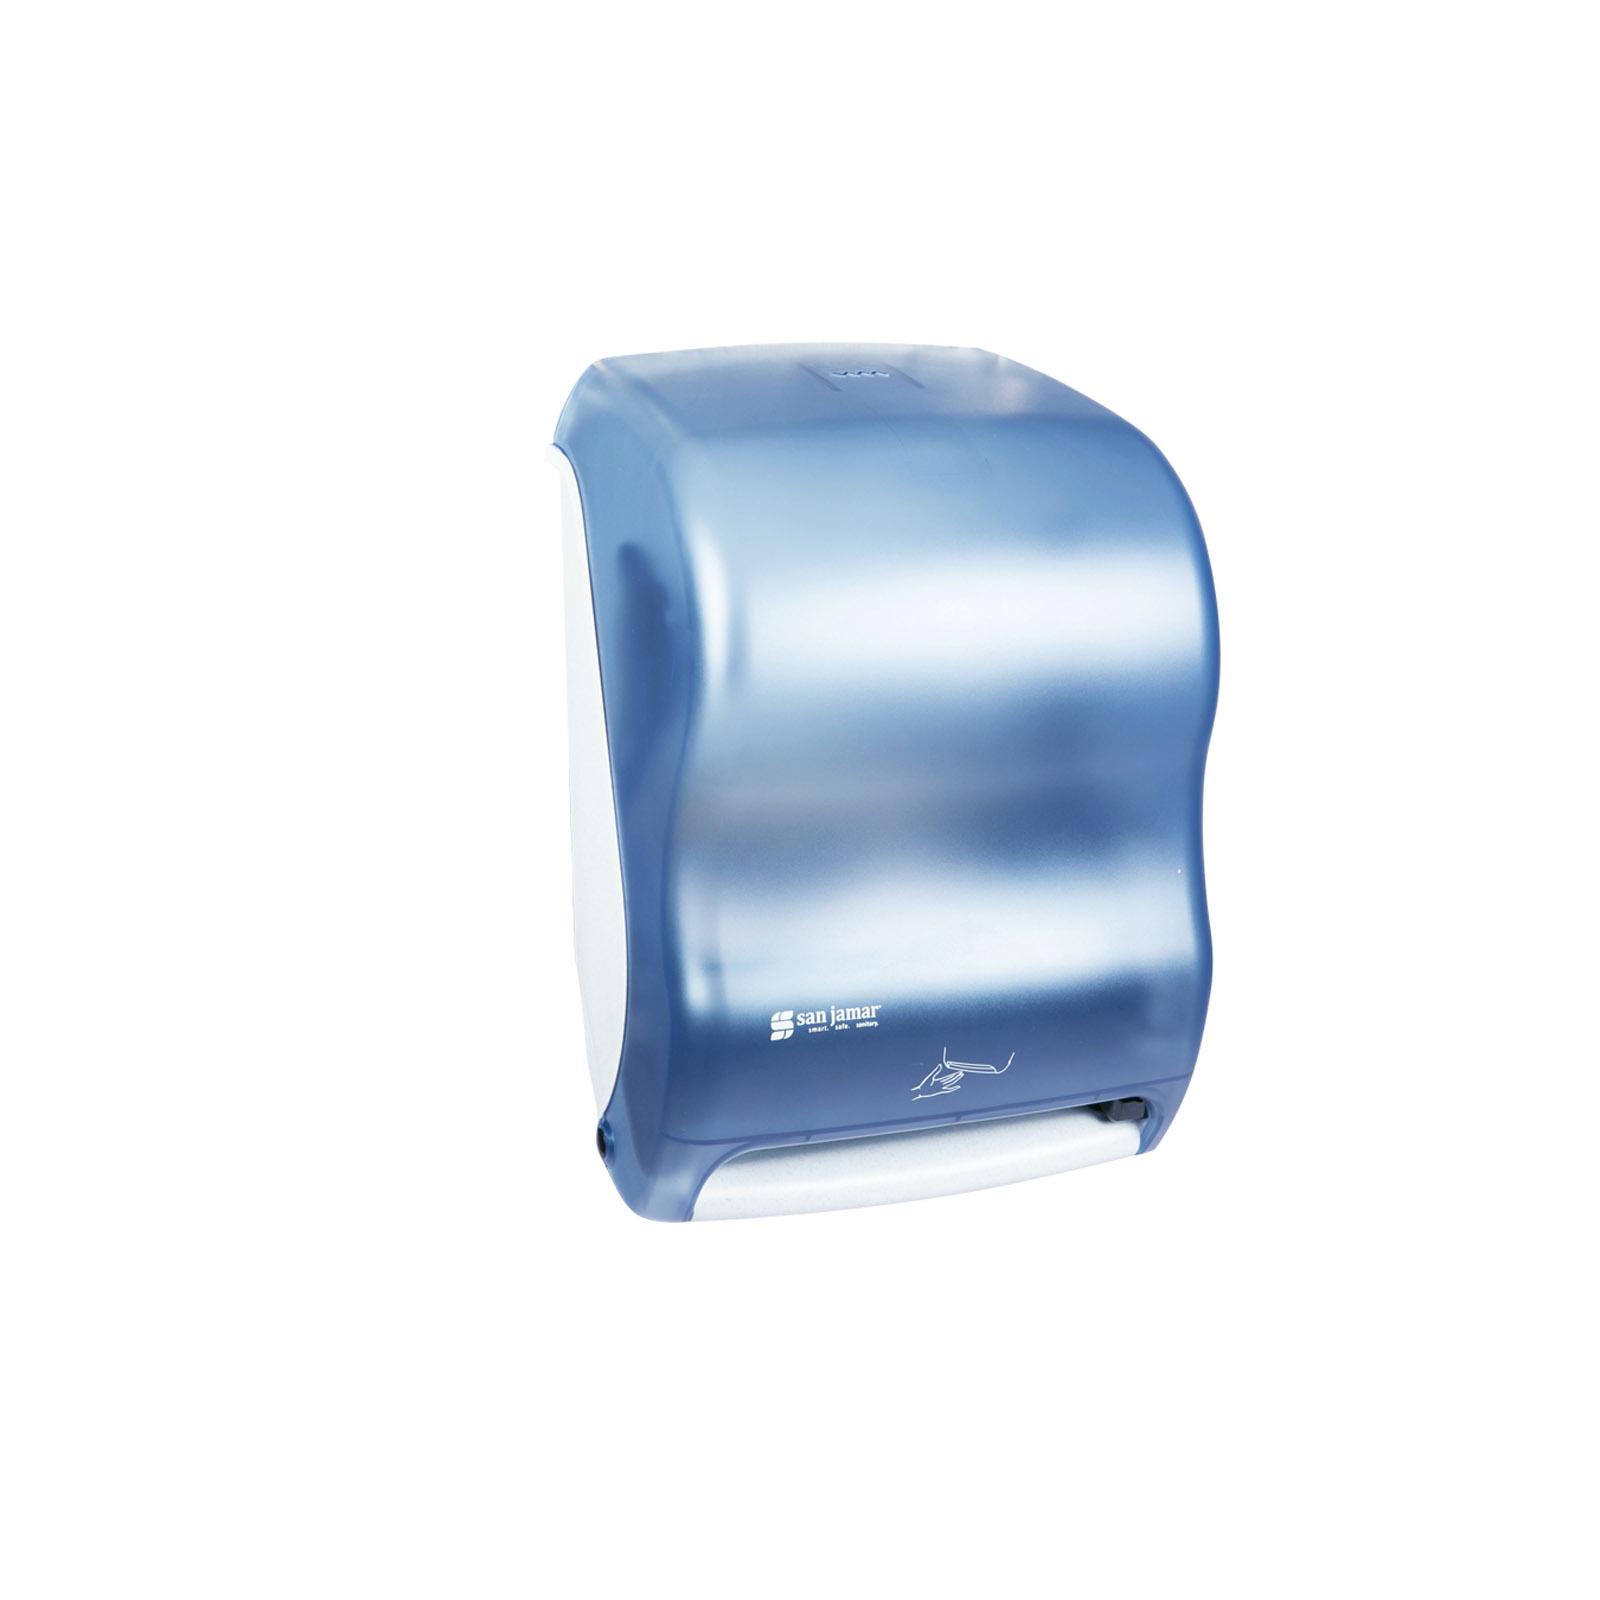 San Jamar T1400TBL paper towel dispenser